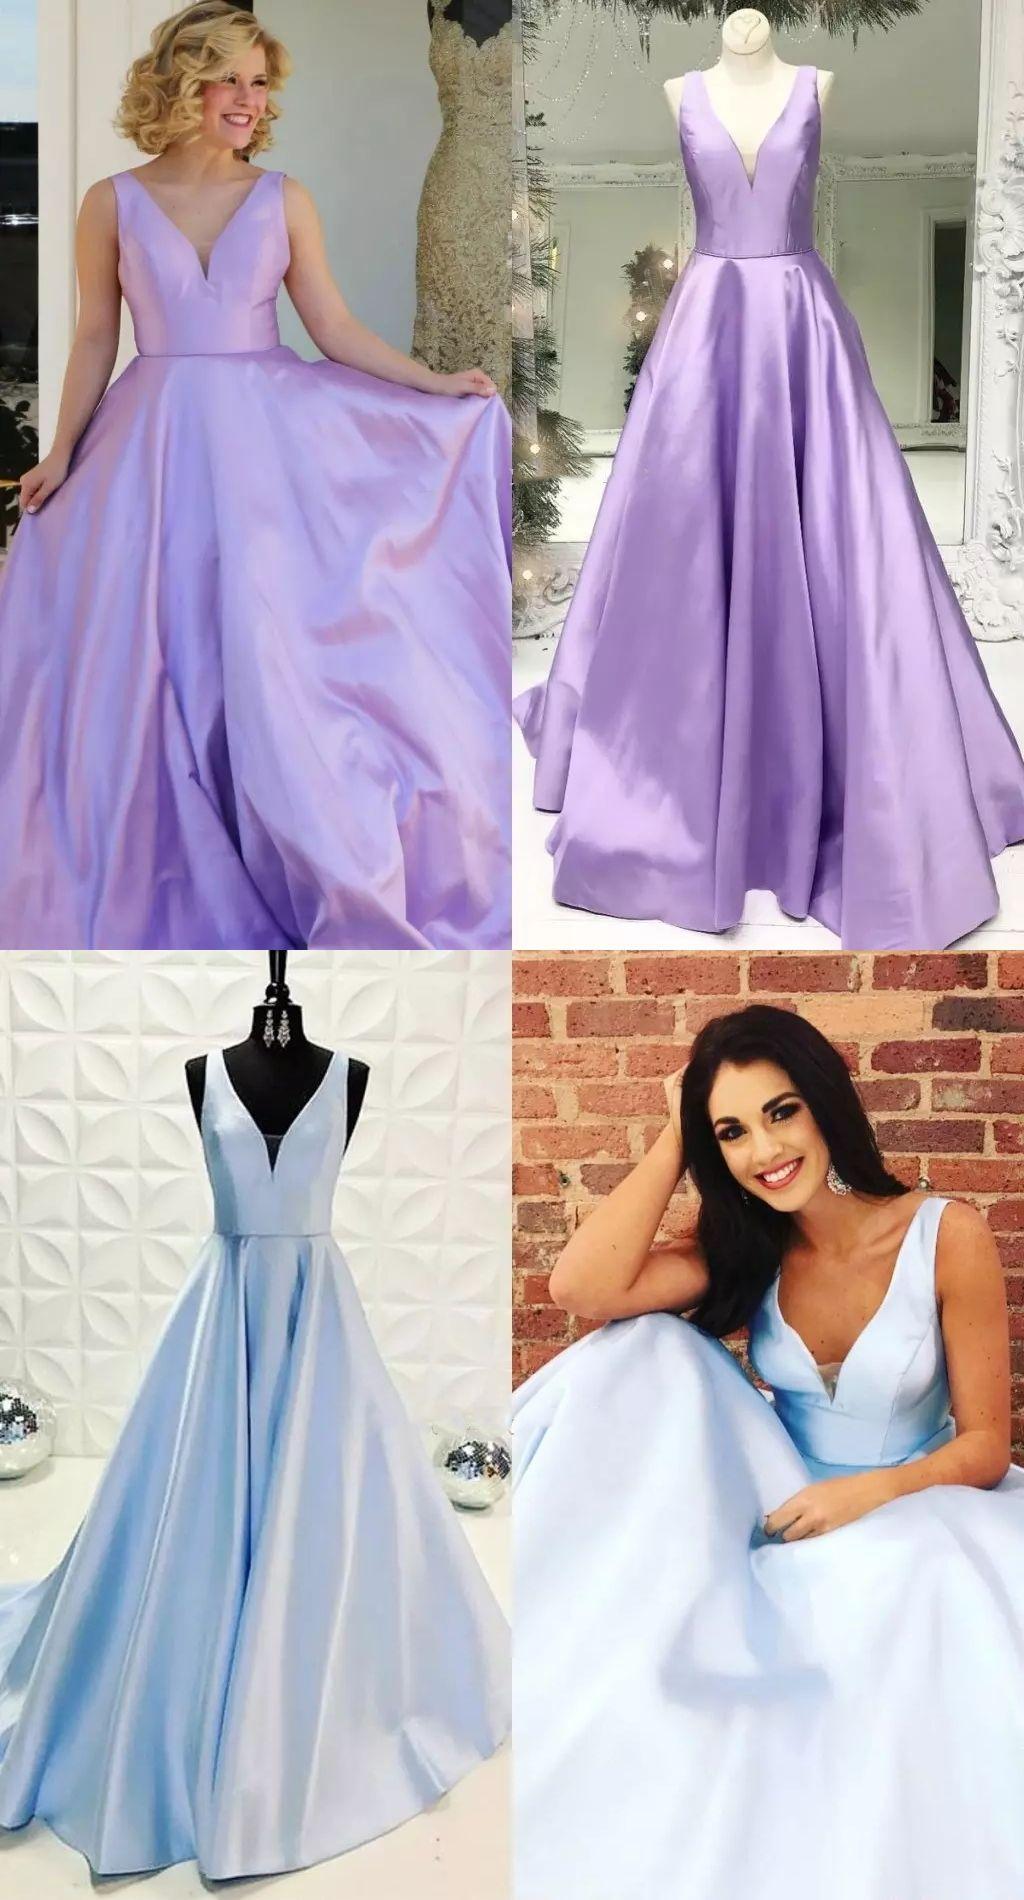 Aline vneck backless light sky blue satin prom dress with pockets